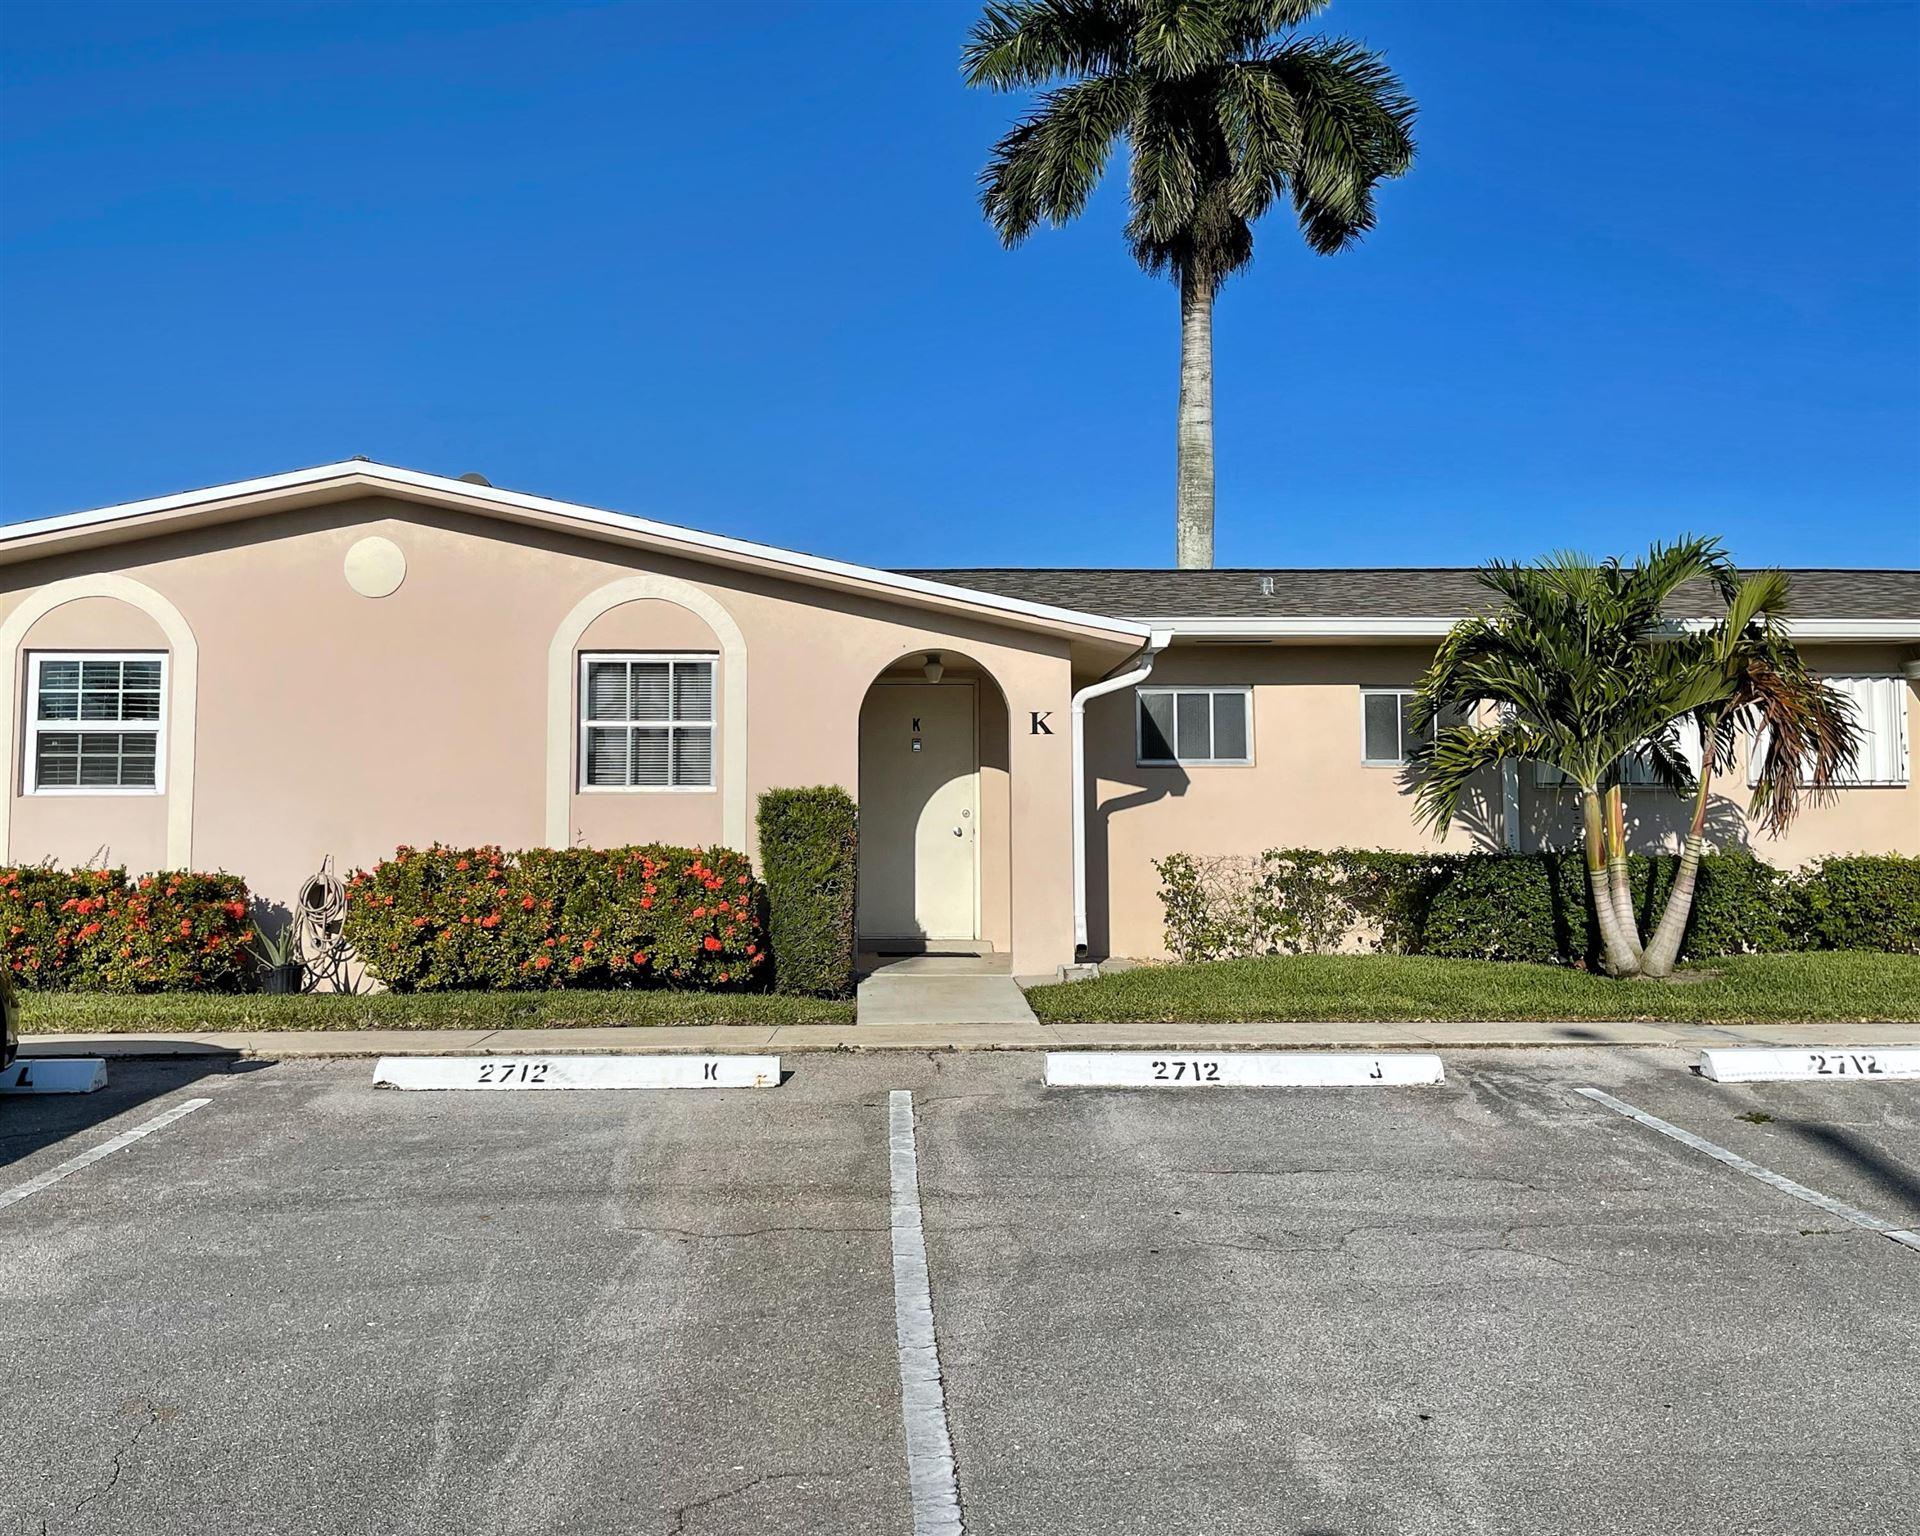 2712 Dudley Drive E #K, West Palm Beach, FL 33415 - MLS#: RX-10720878